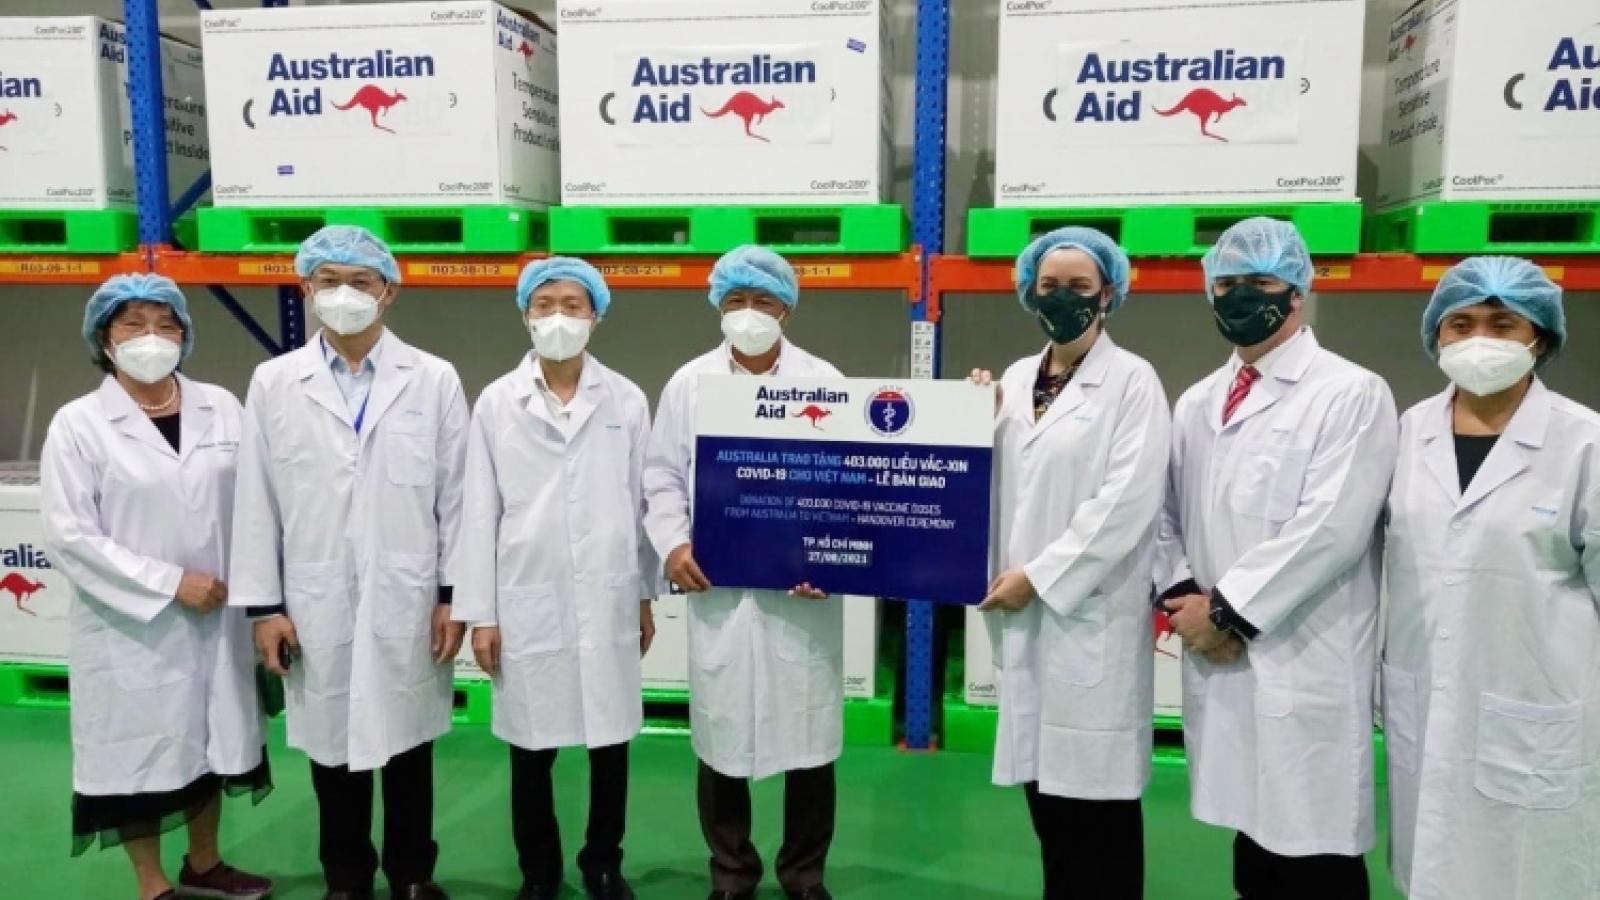 Vietnam receives 300,000 AstraZeneca vaccine doses from Australia